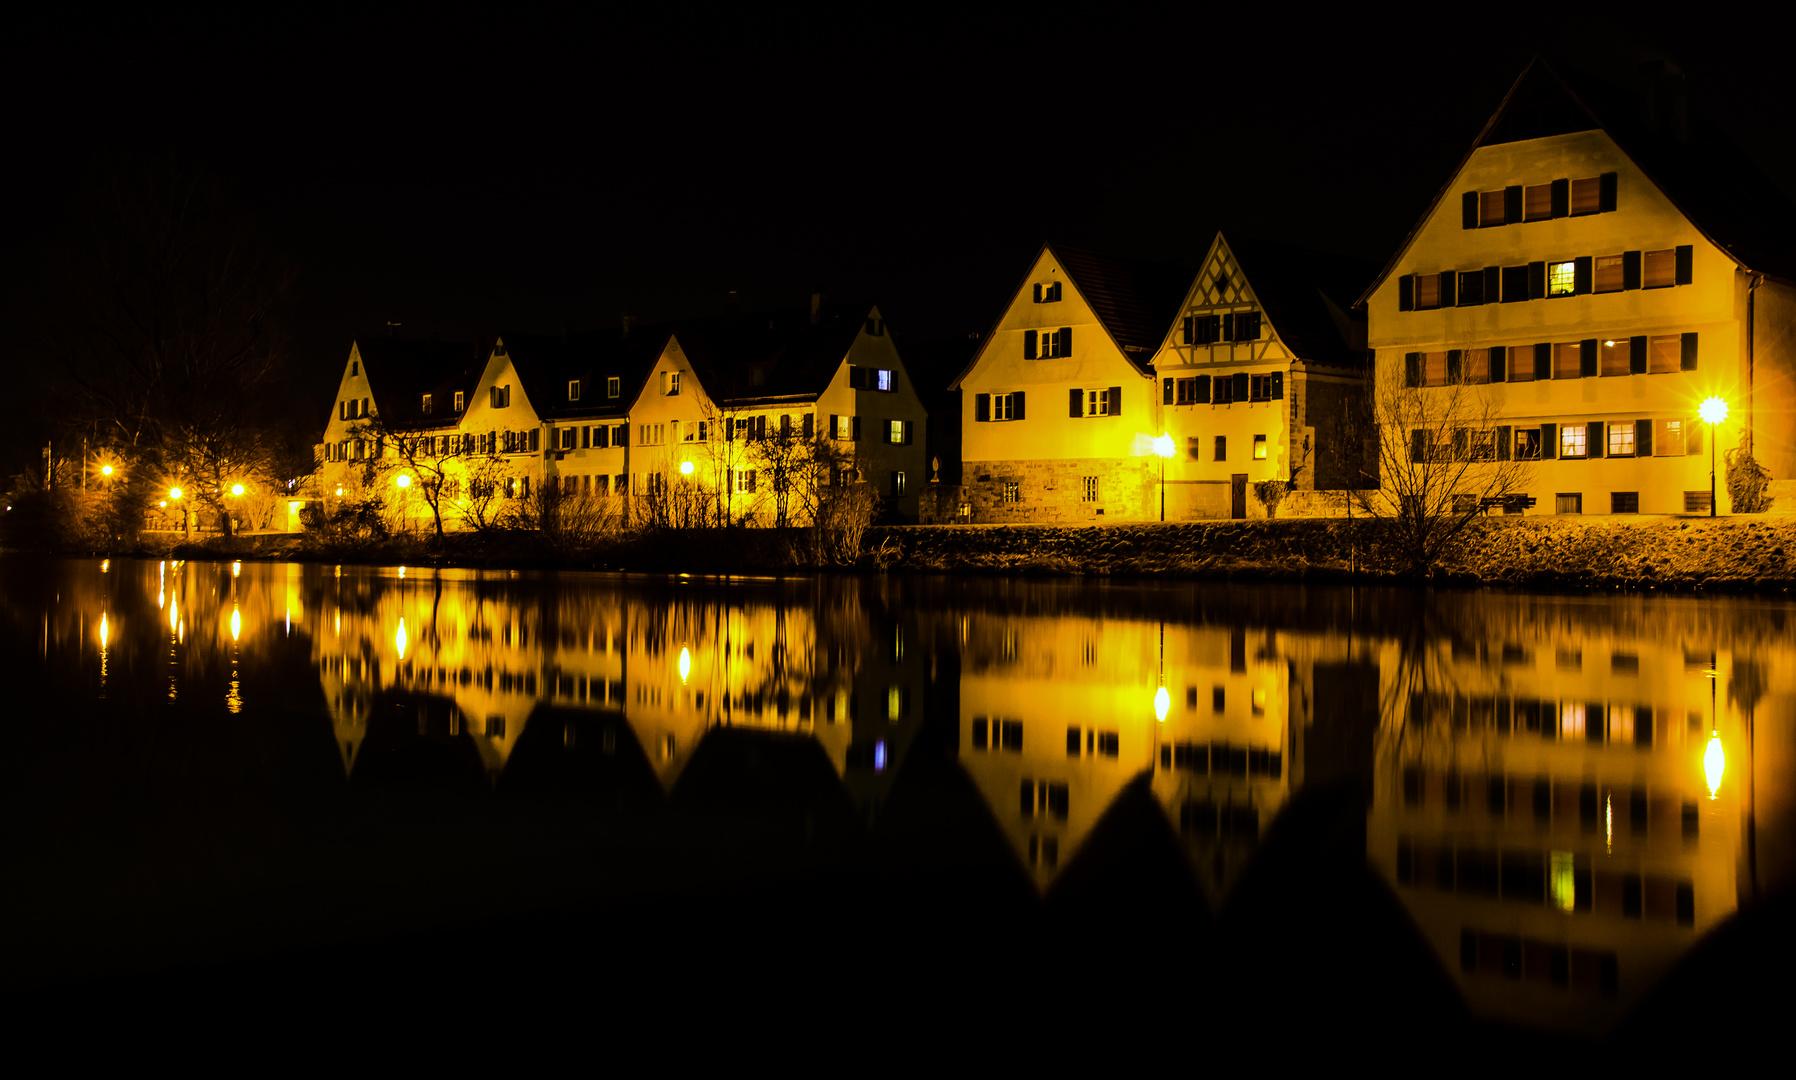 Neckarufer, Rottenburg a.N